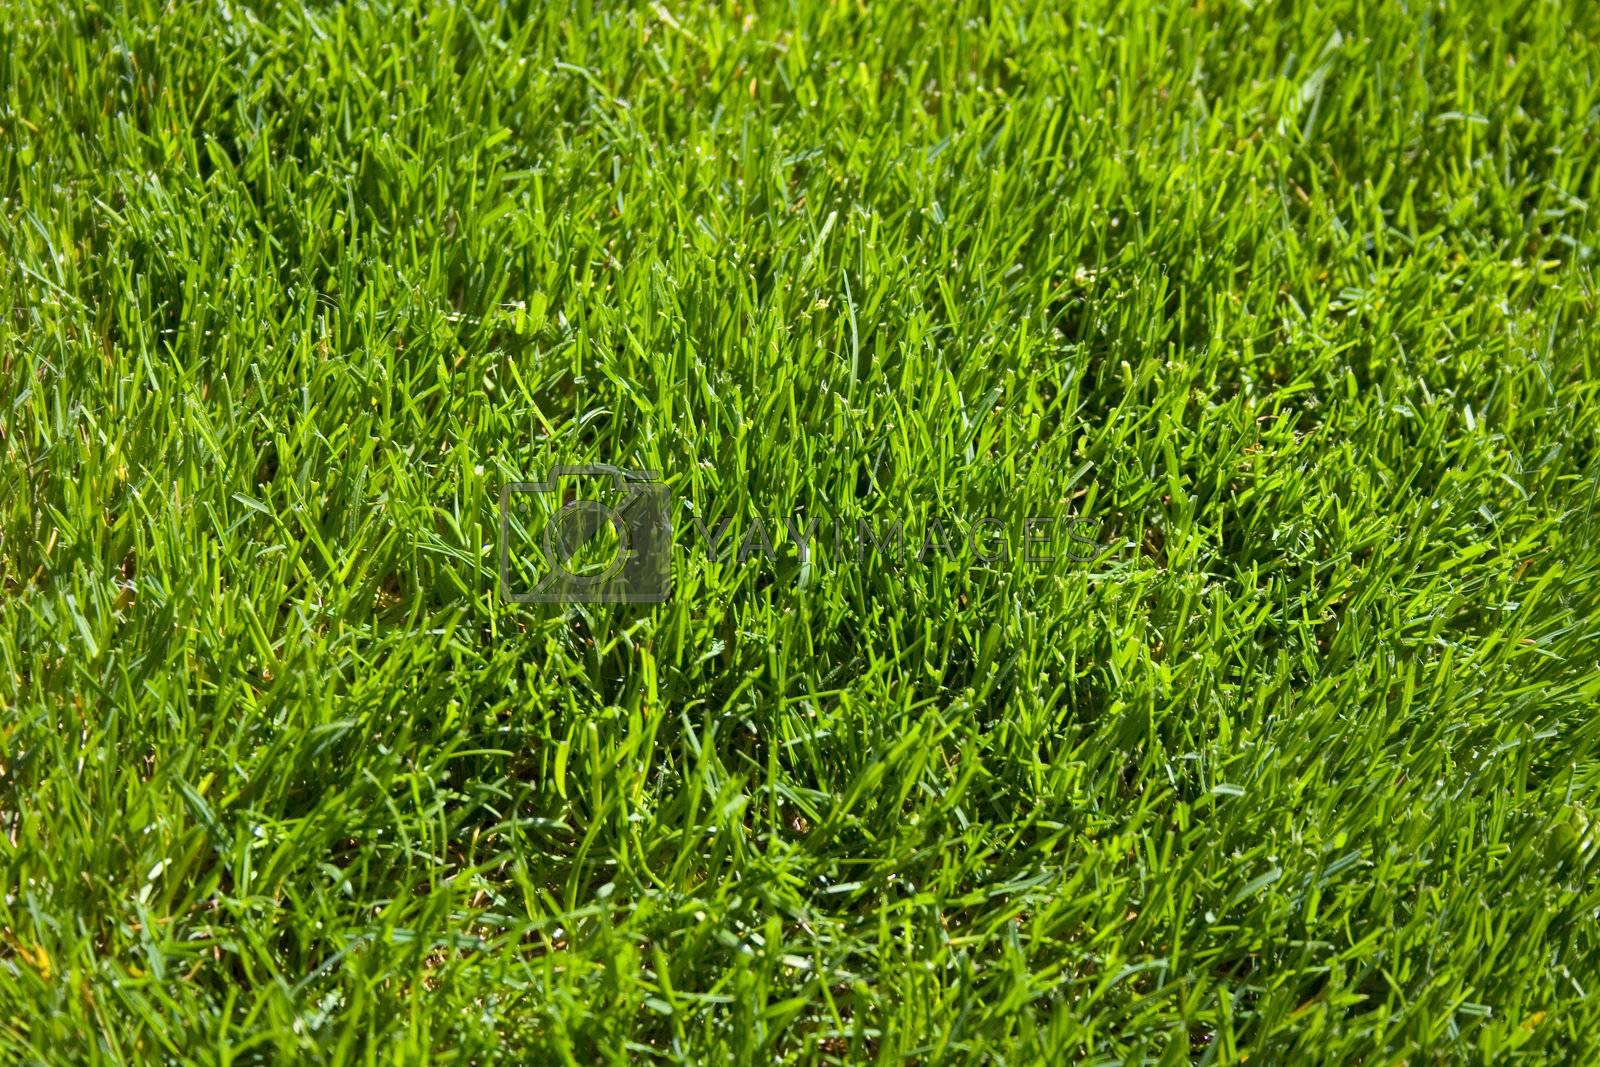 Grass Texture by jclardy